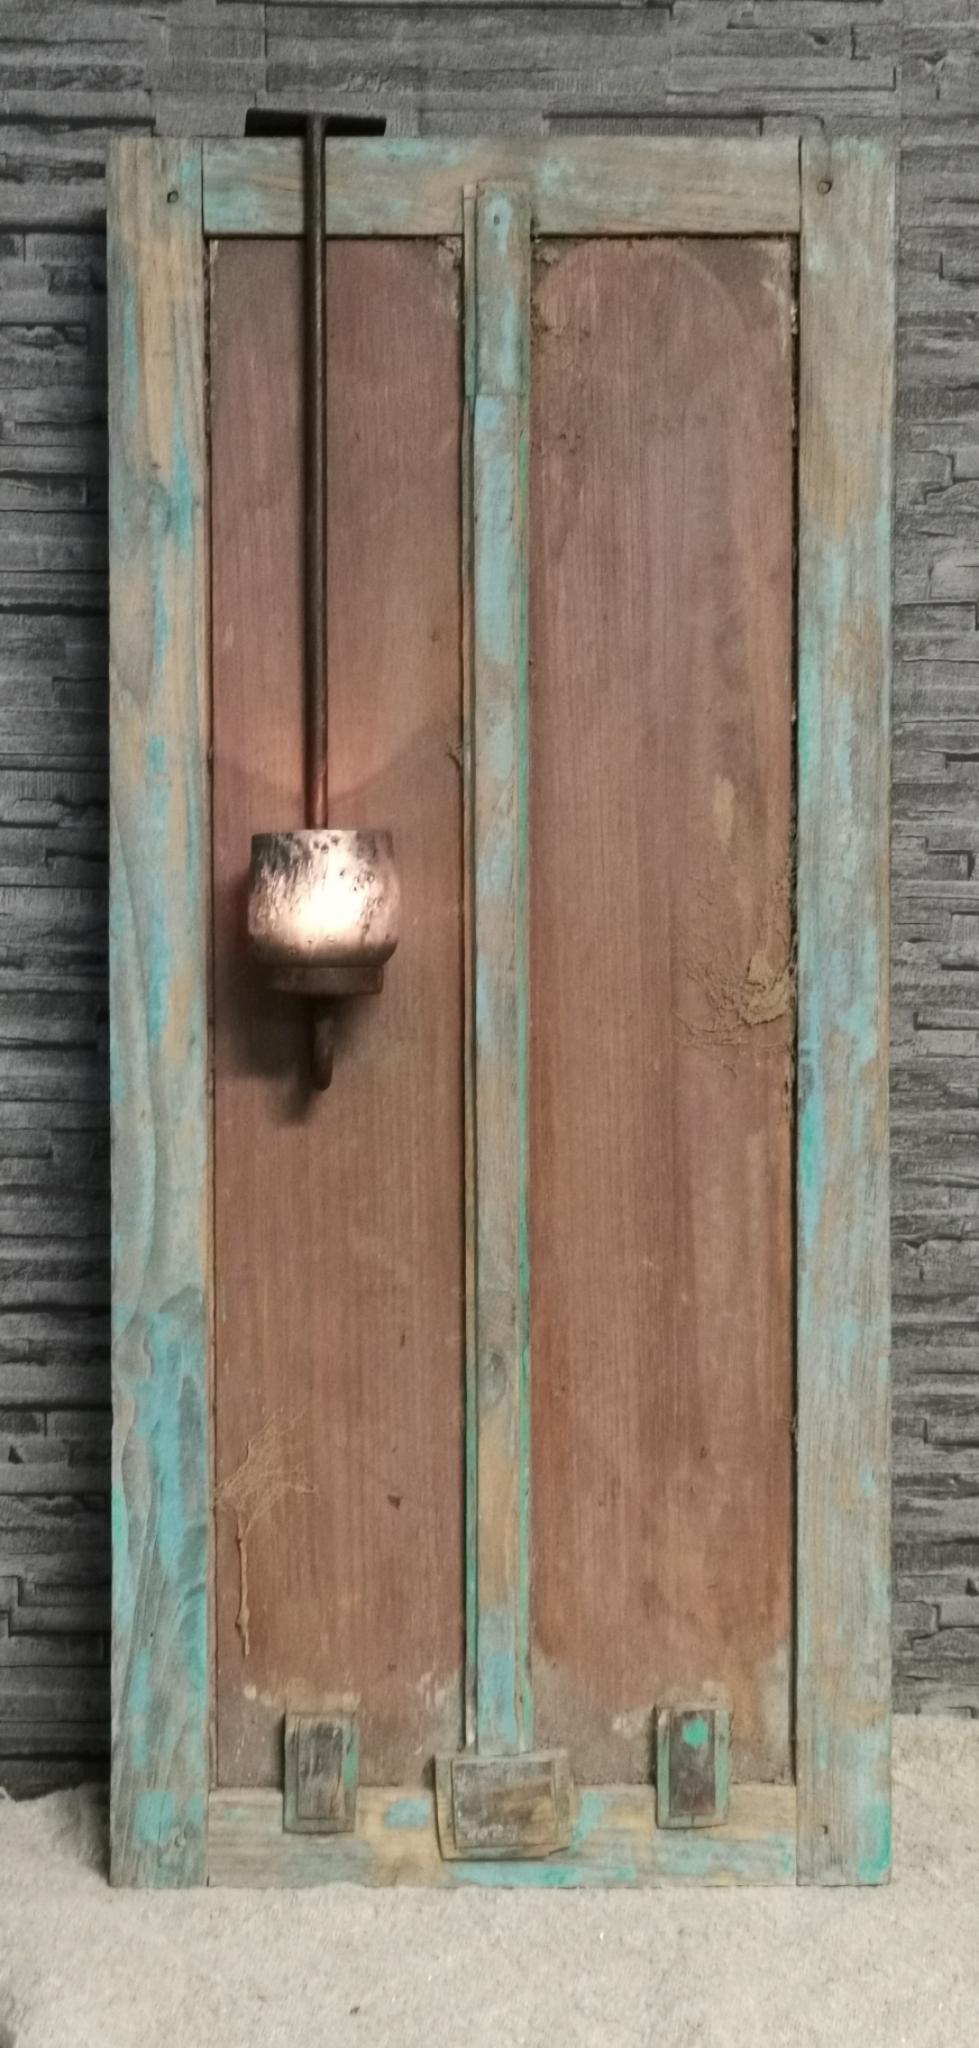 Oude houten deur #3 01746